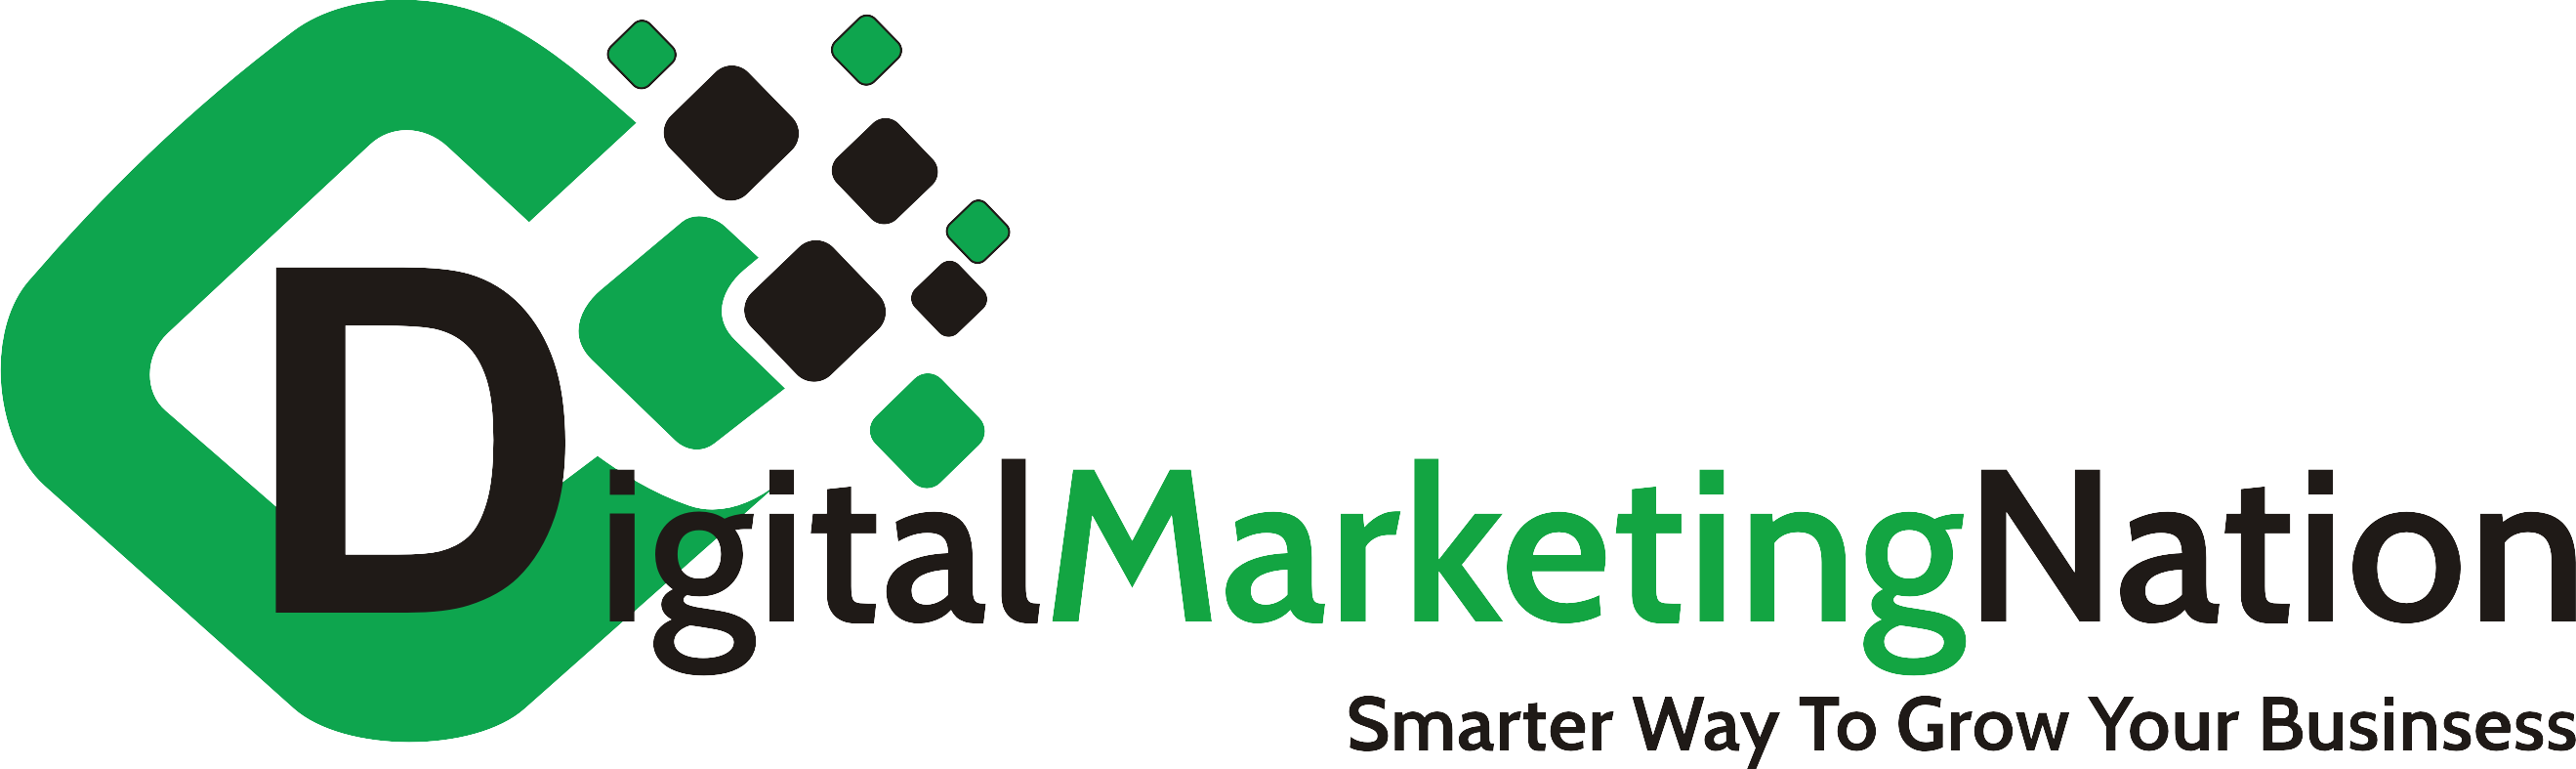 Jhonmikerishi images digital marketing nation logo hd wallpaper and jhonmikerishi images digital marketing nation logo hd wallpaper and background photos thecheapjerseys Choice Image